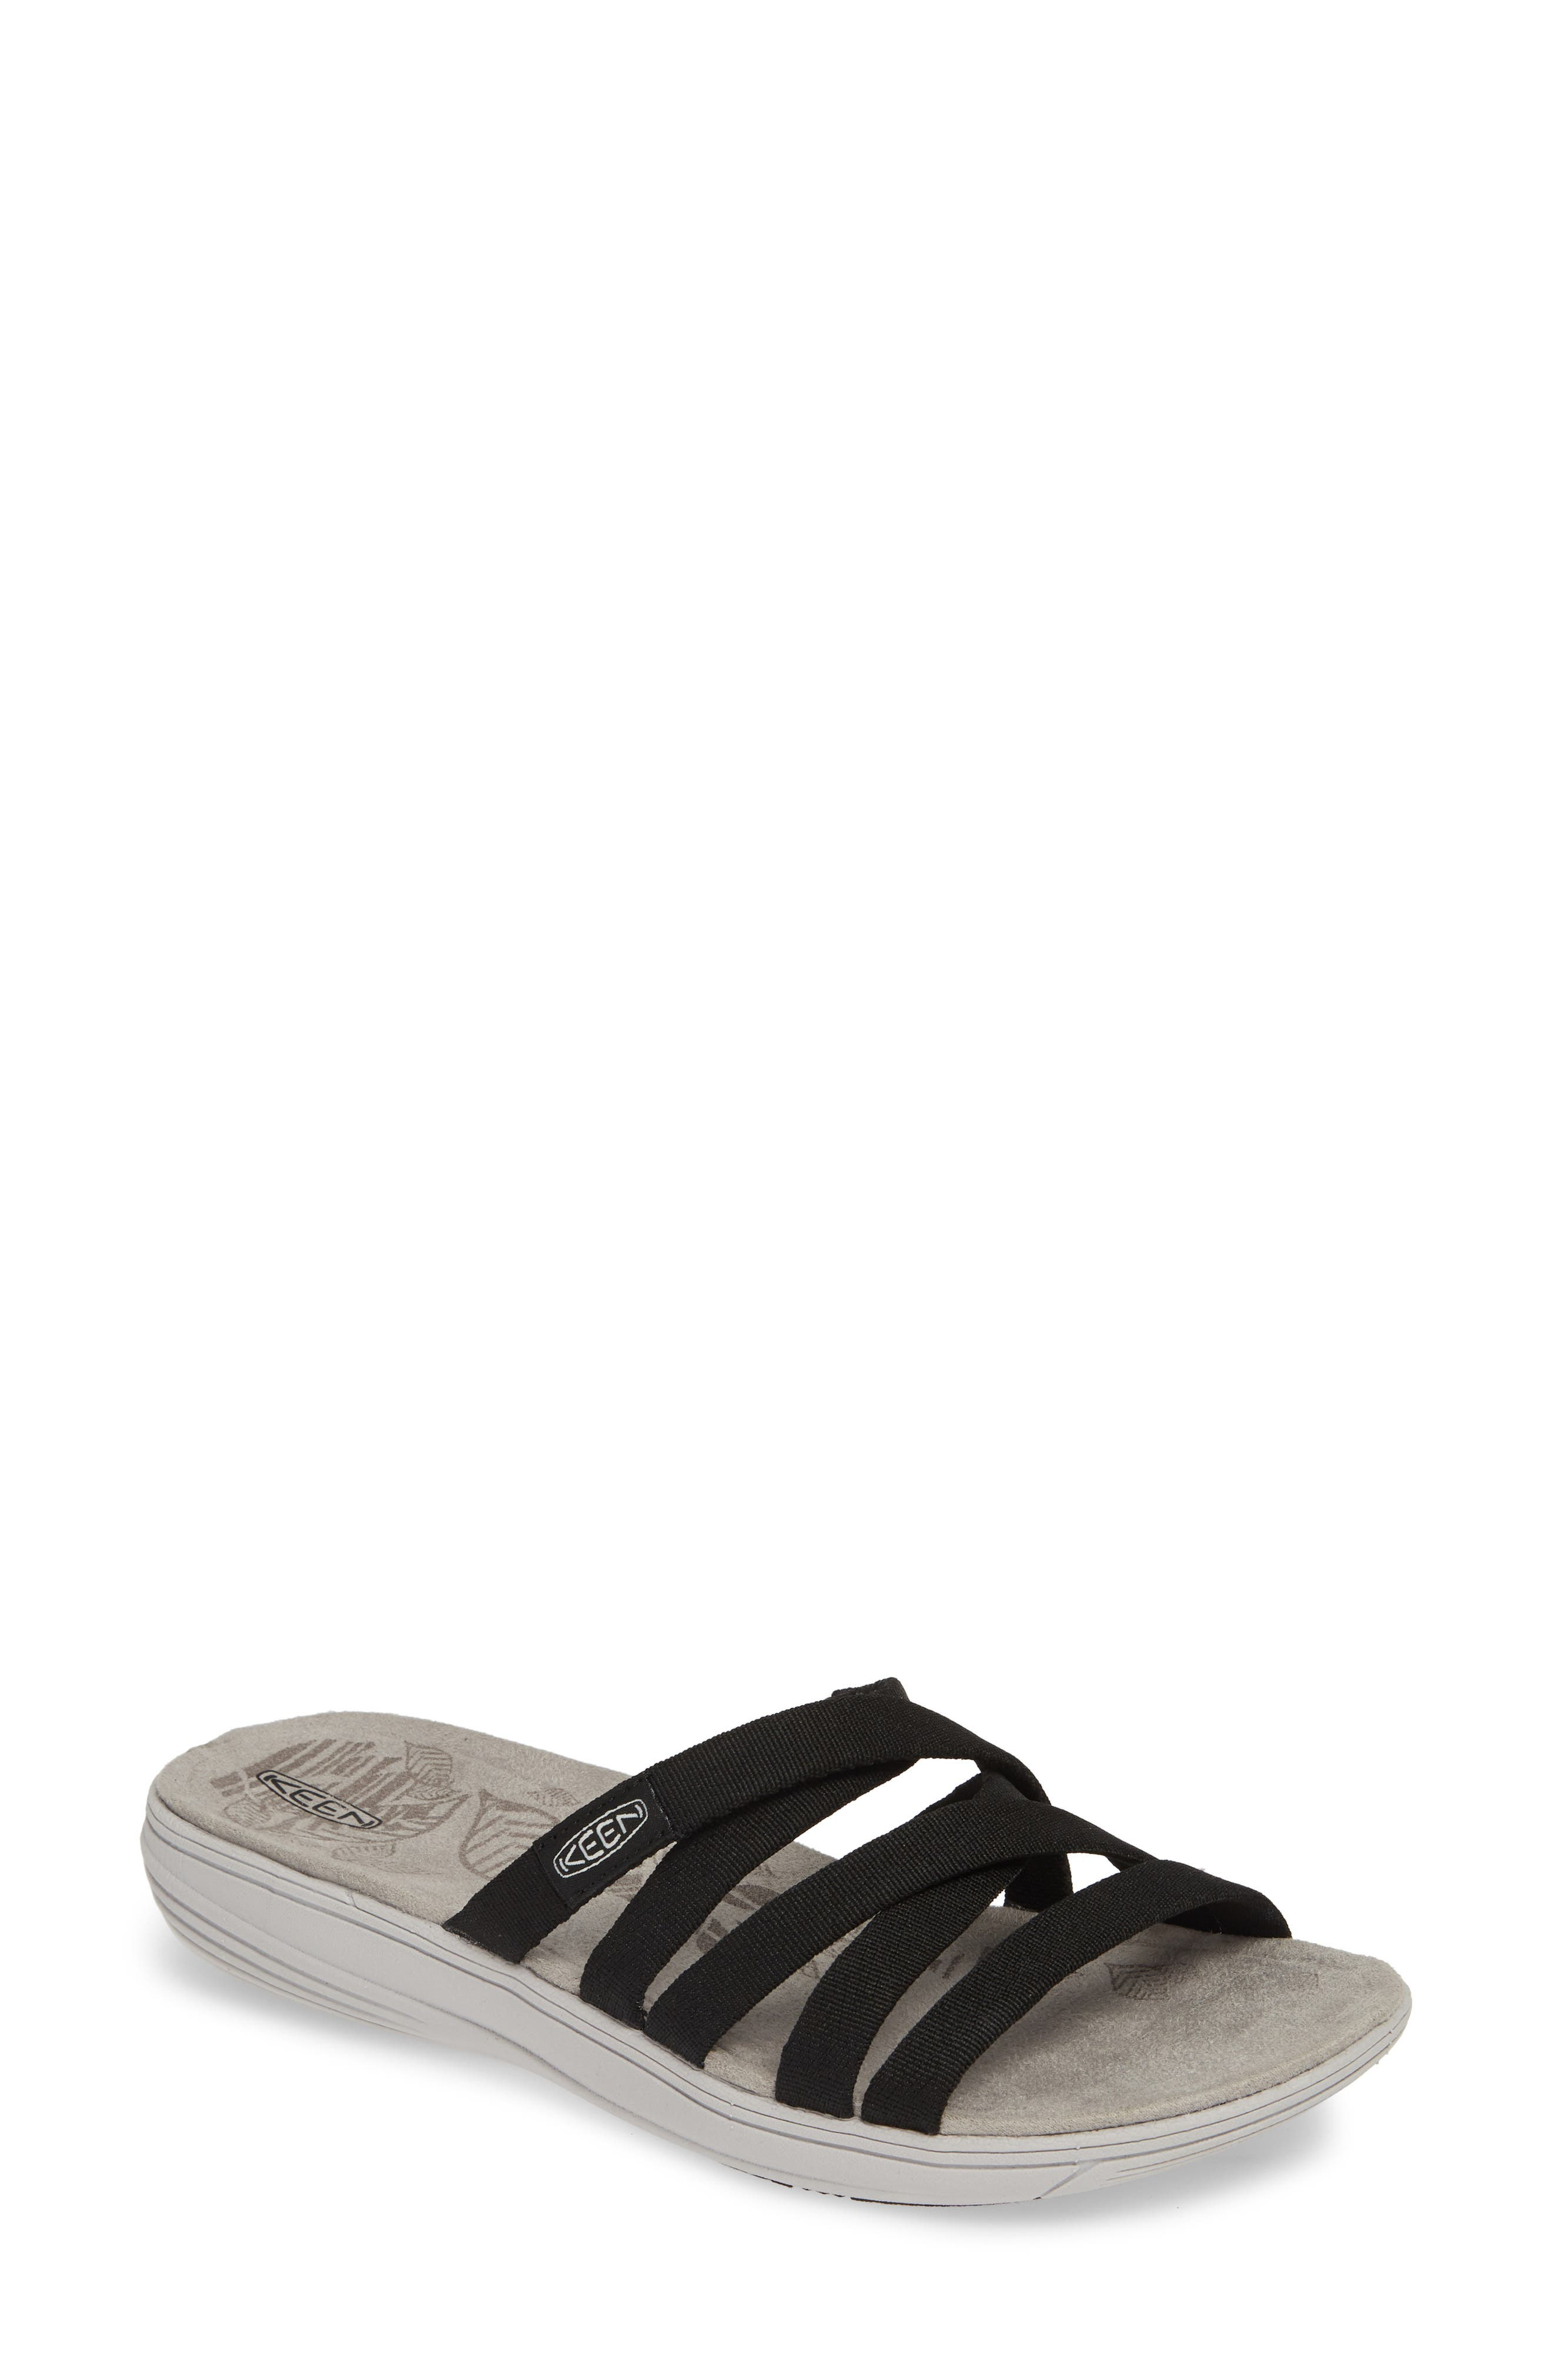 Keen Damaya Slide Sandal- Black